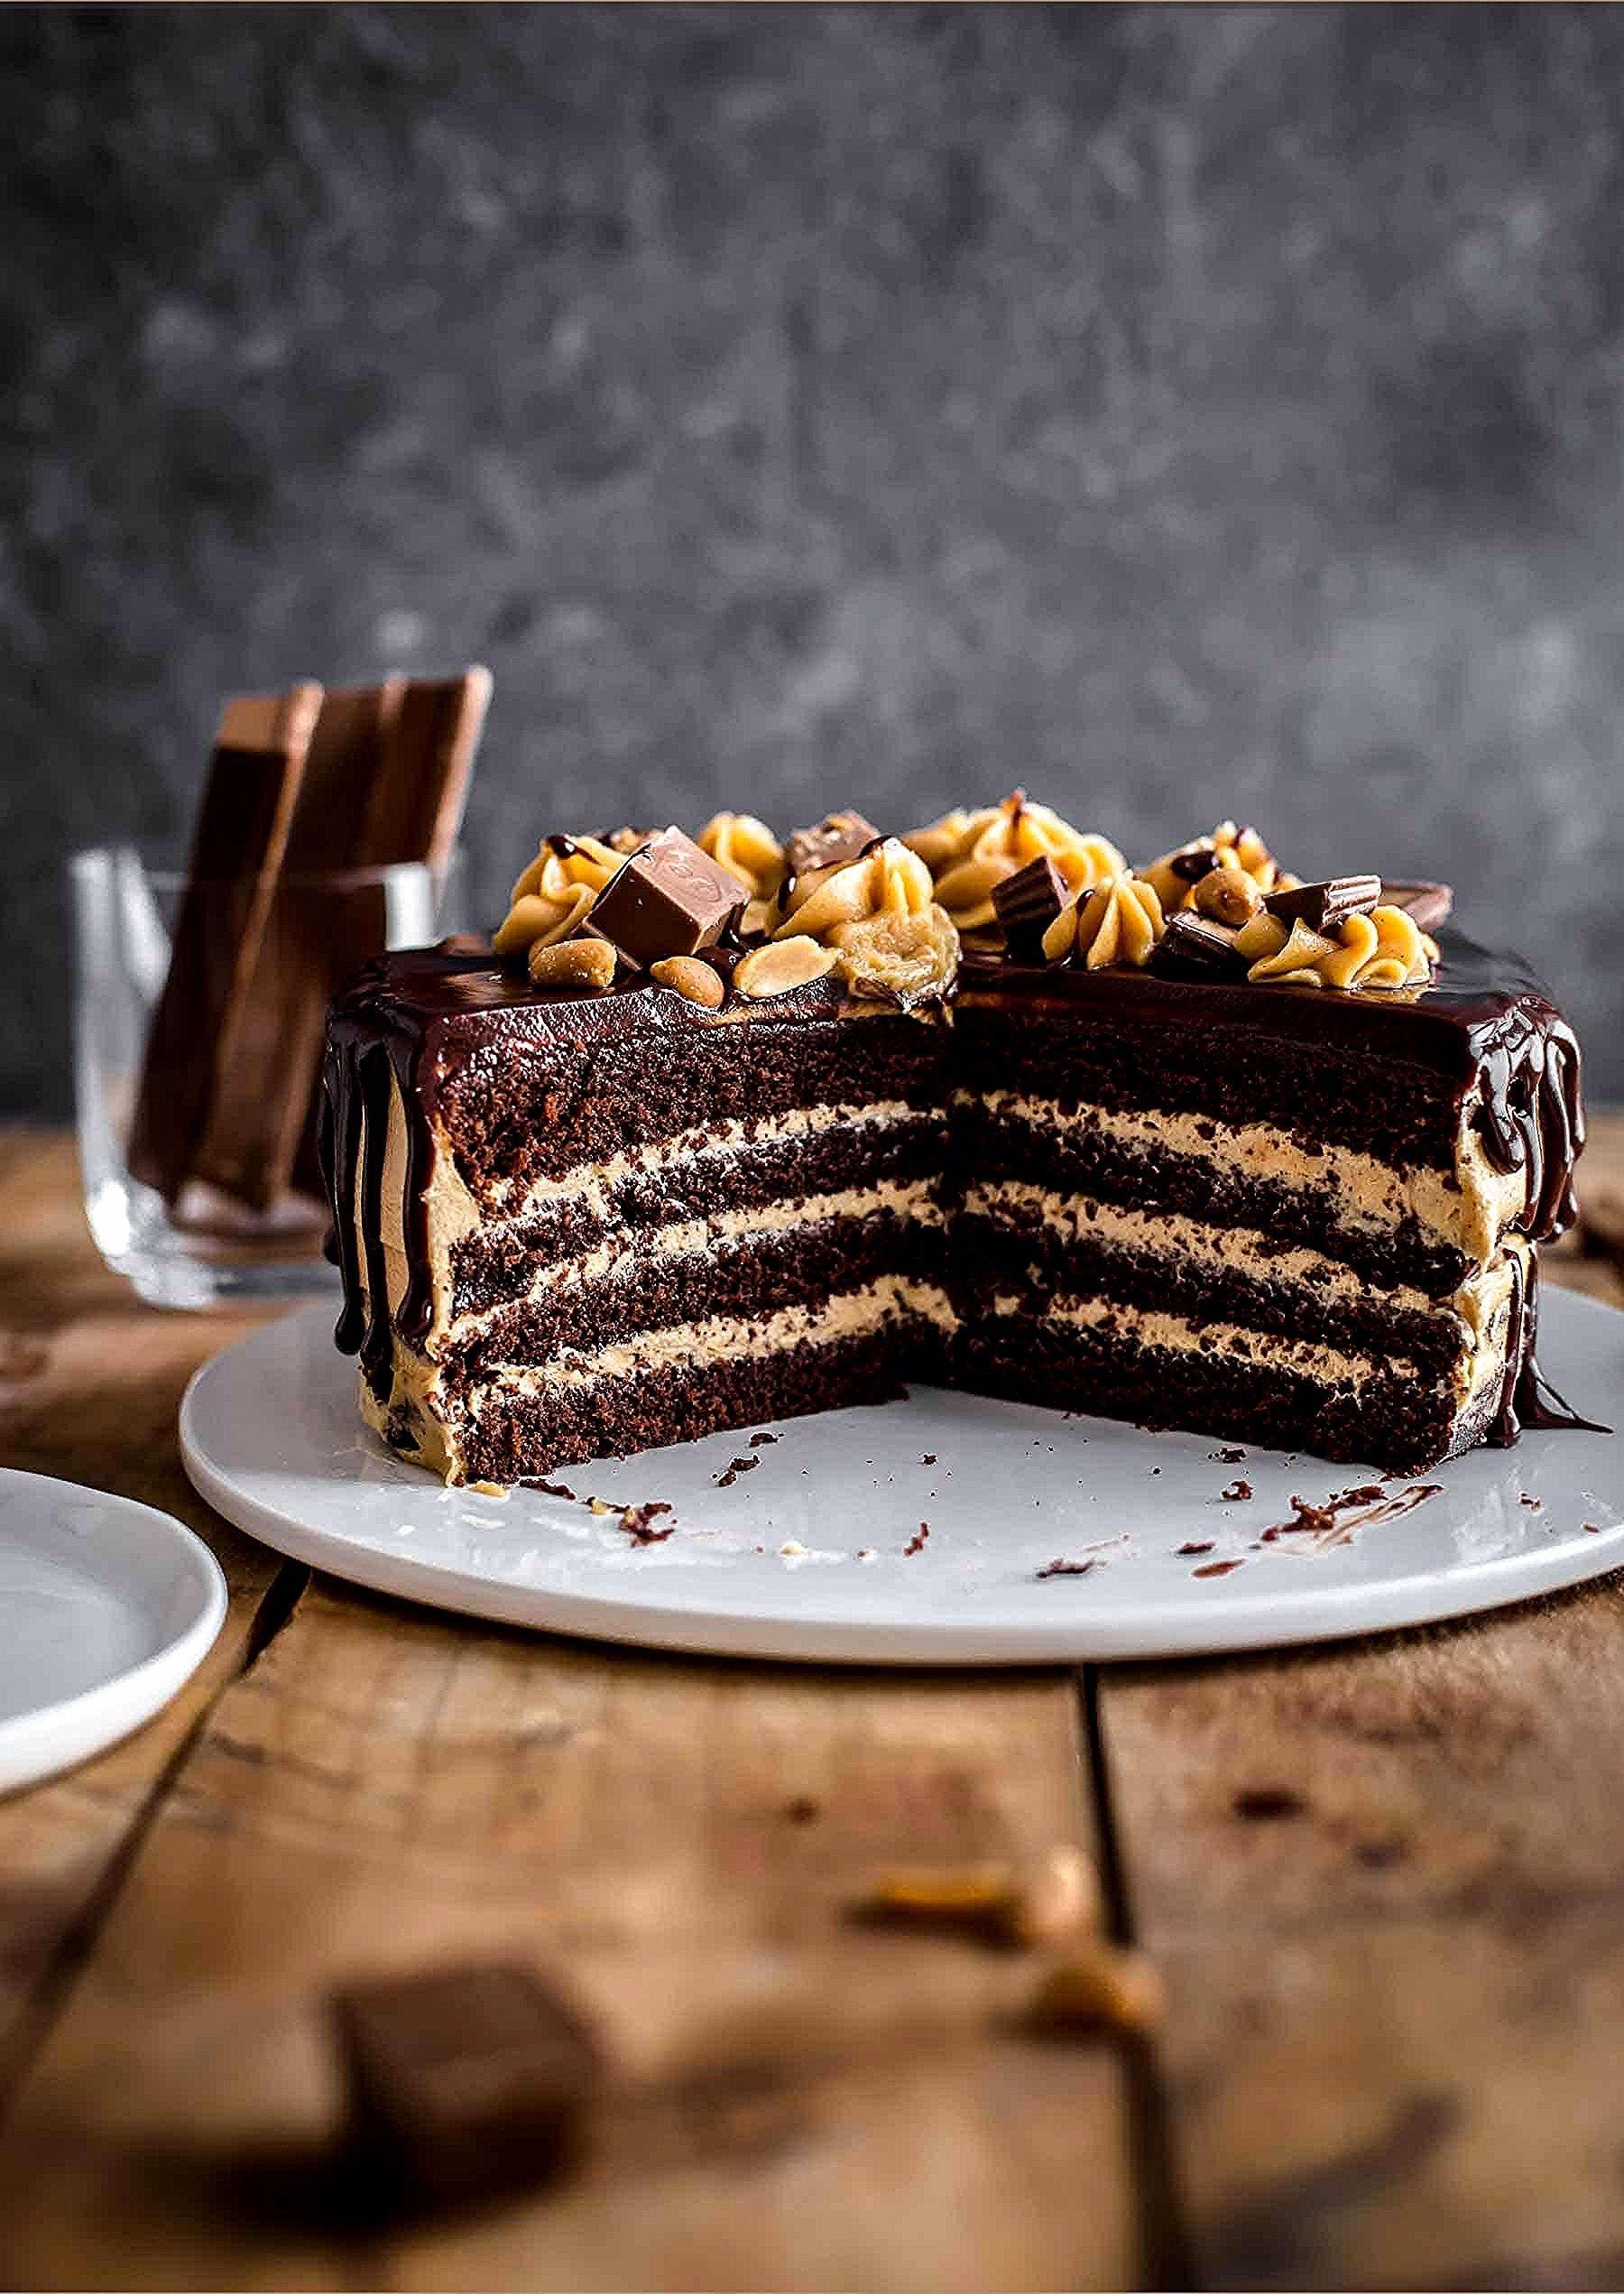 5 Ingredients Truffles Biscuit Peanut Butter Chocolate Truffles Recipe وصفة حلى بالبسكويت و زبدة الفول السوداني المغطاه بالشو Desserts Food Truffles